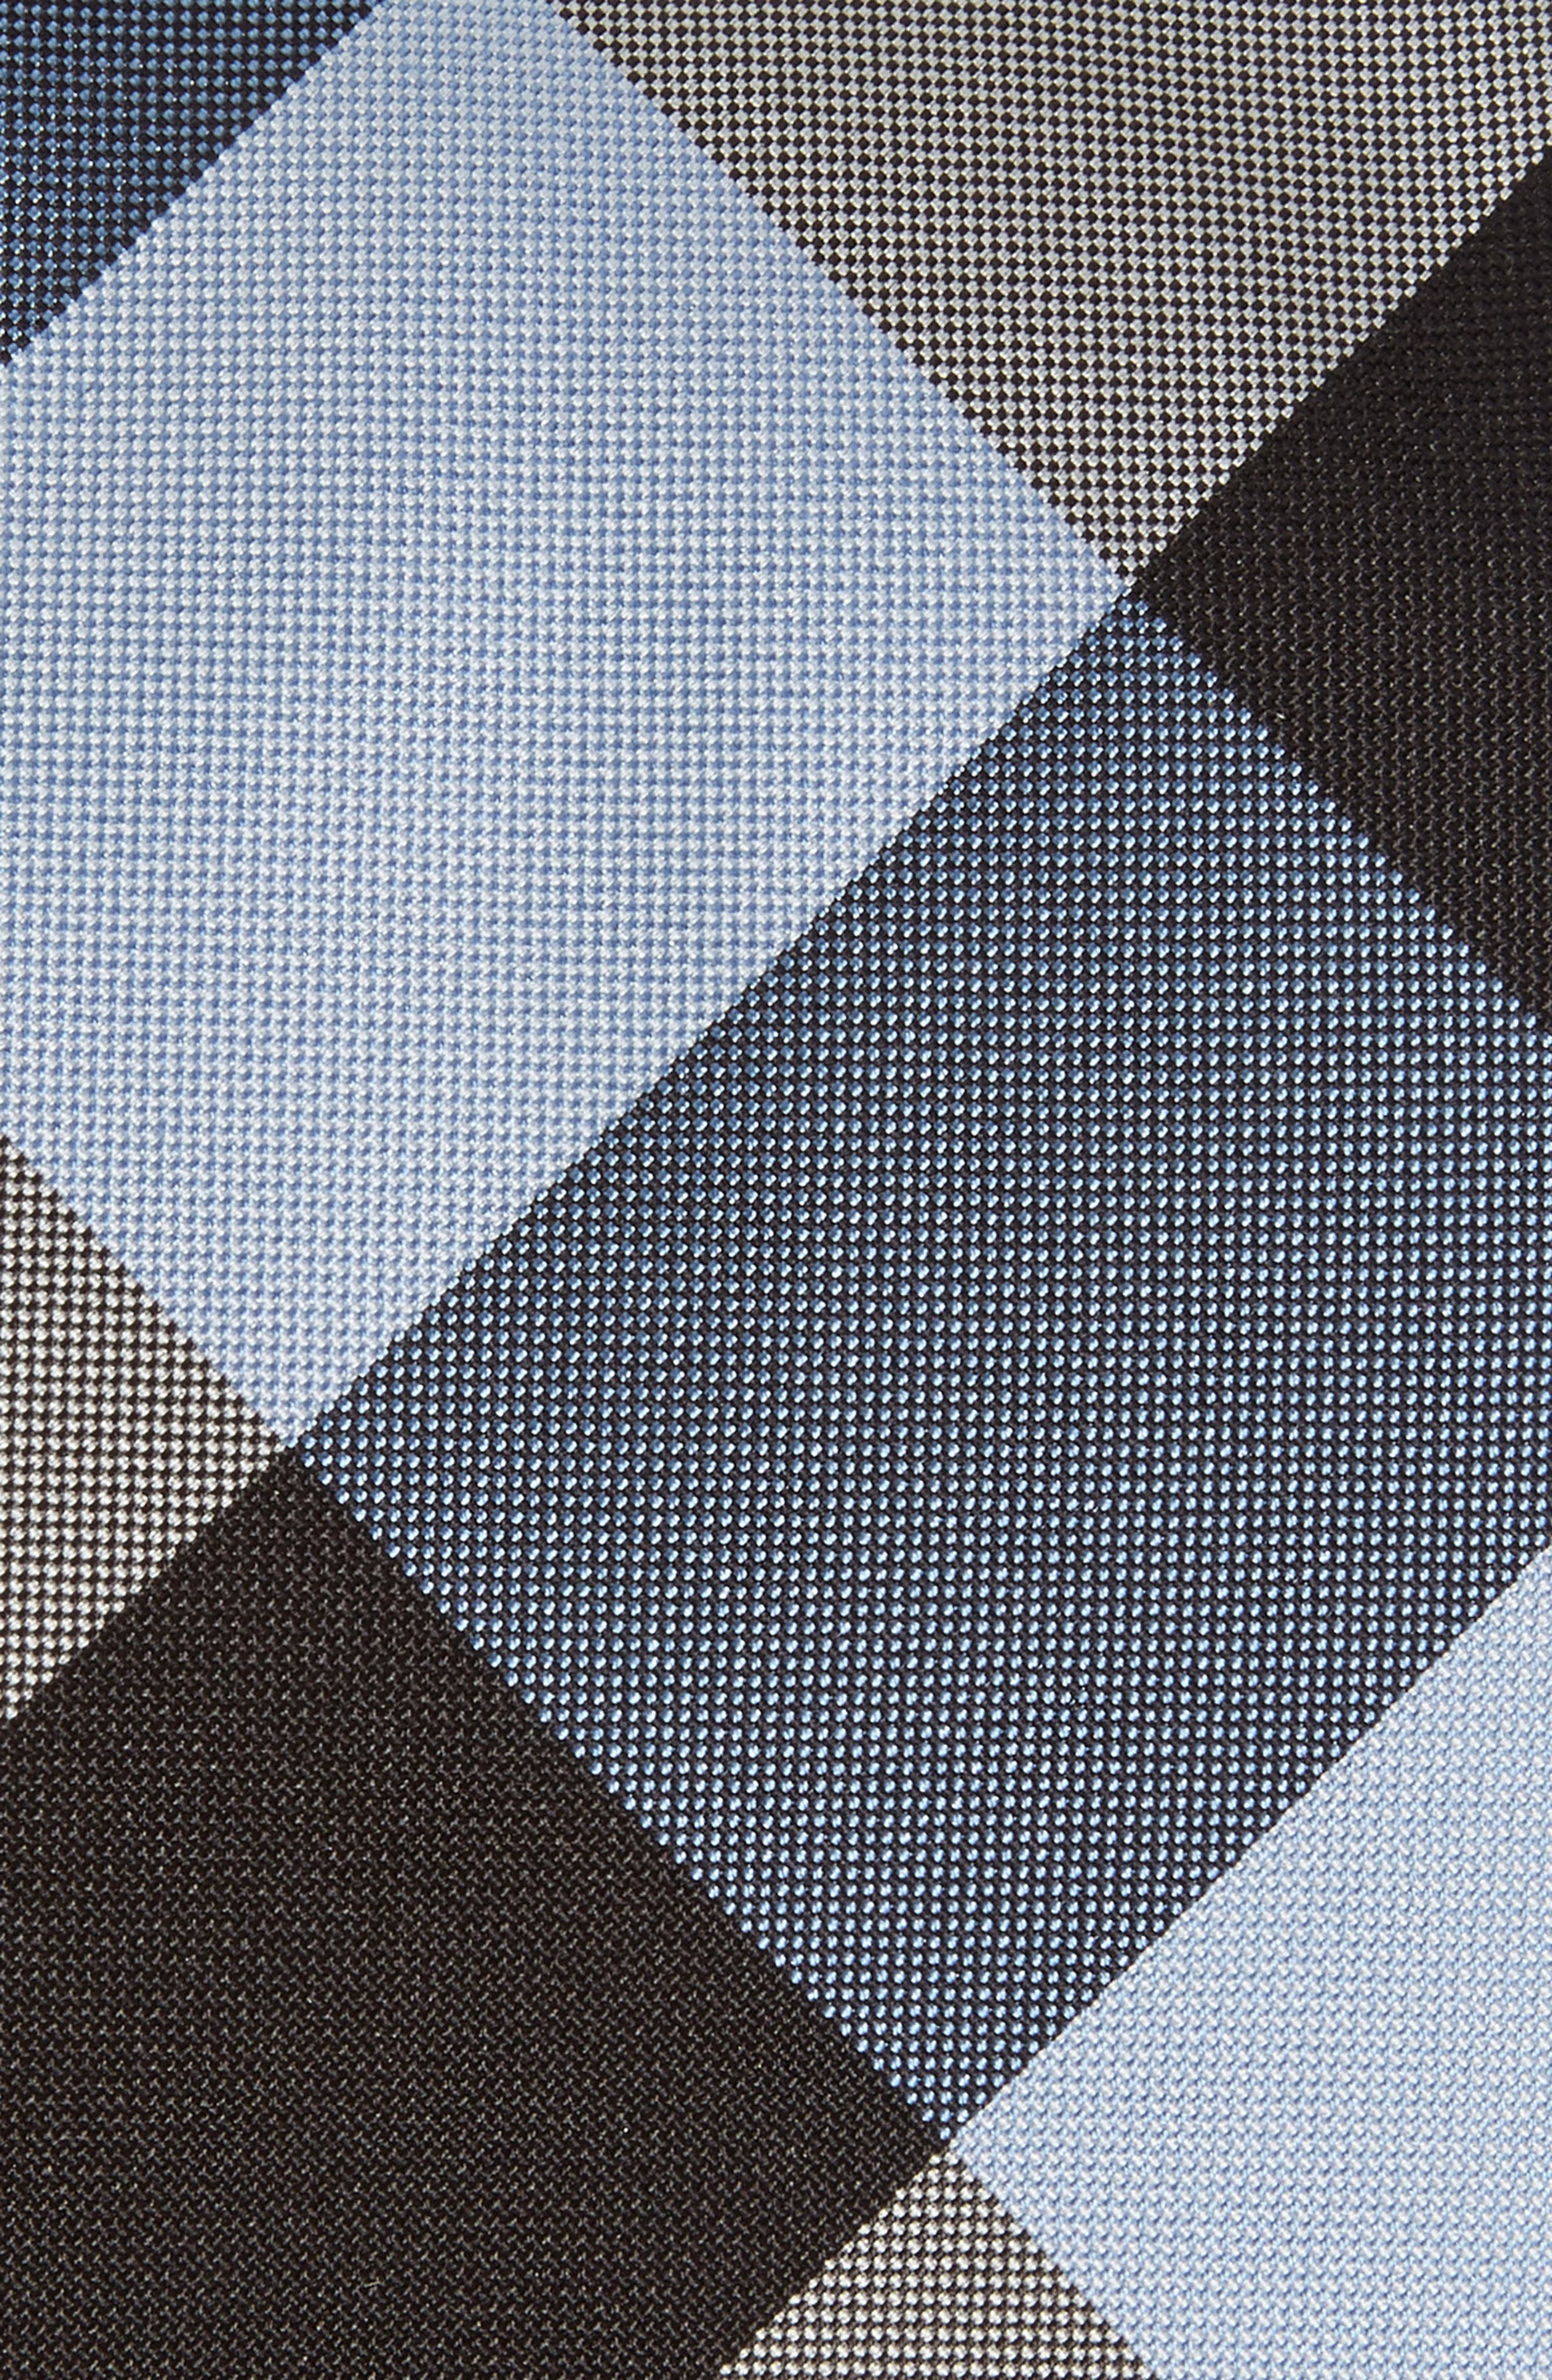 Clinton Silk Tie,                             Alternate thumbnail 2, color,                             451